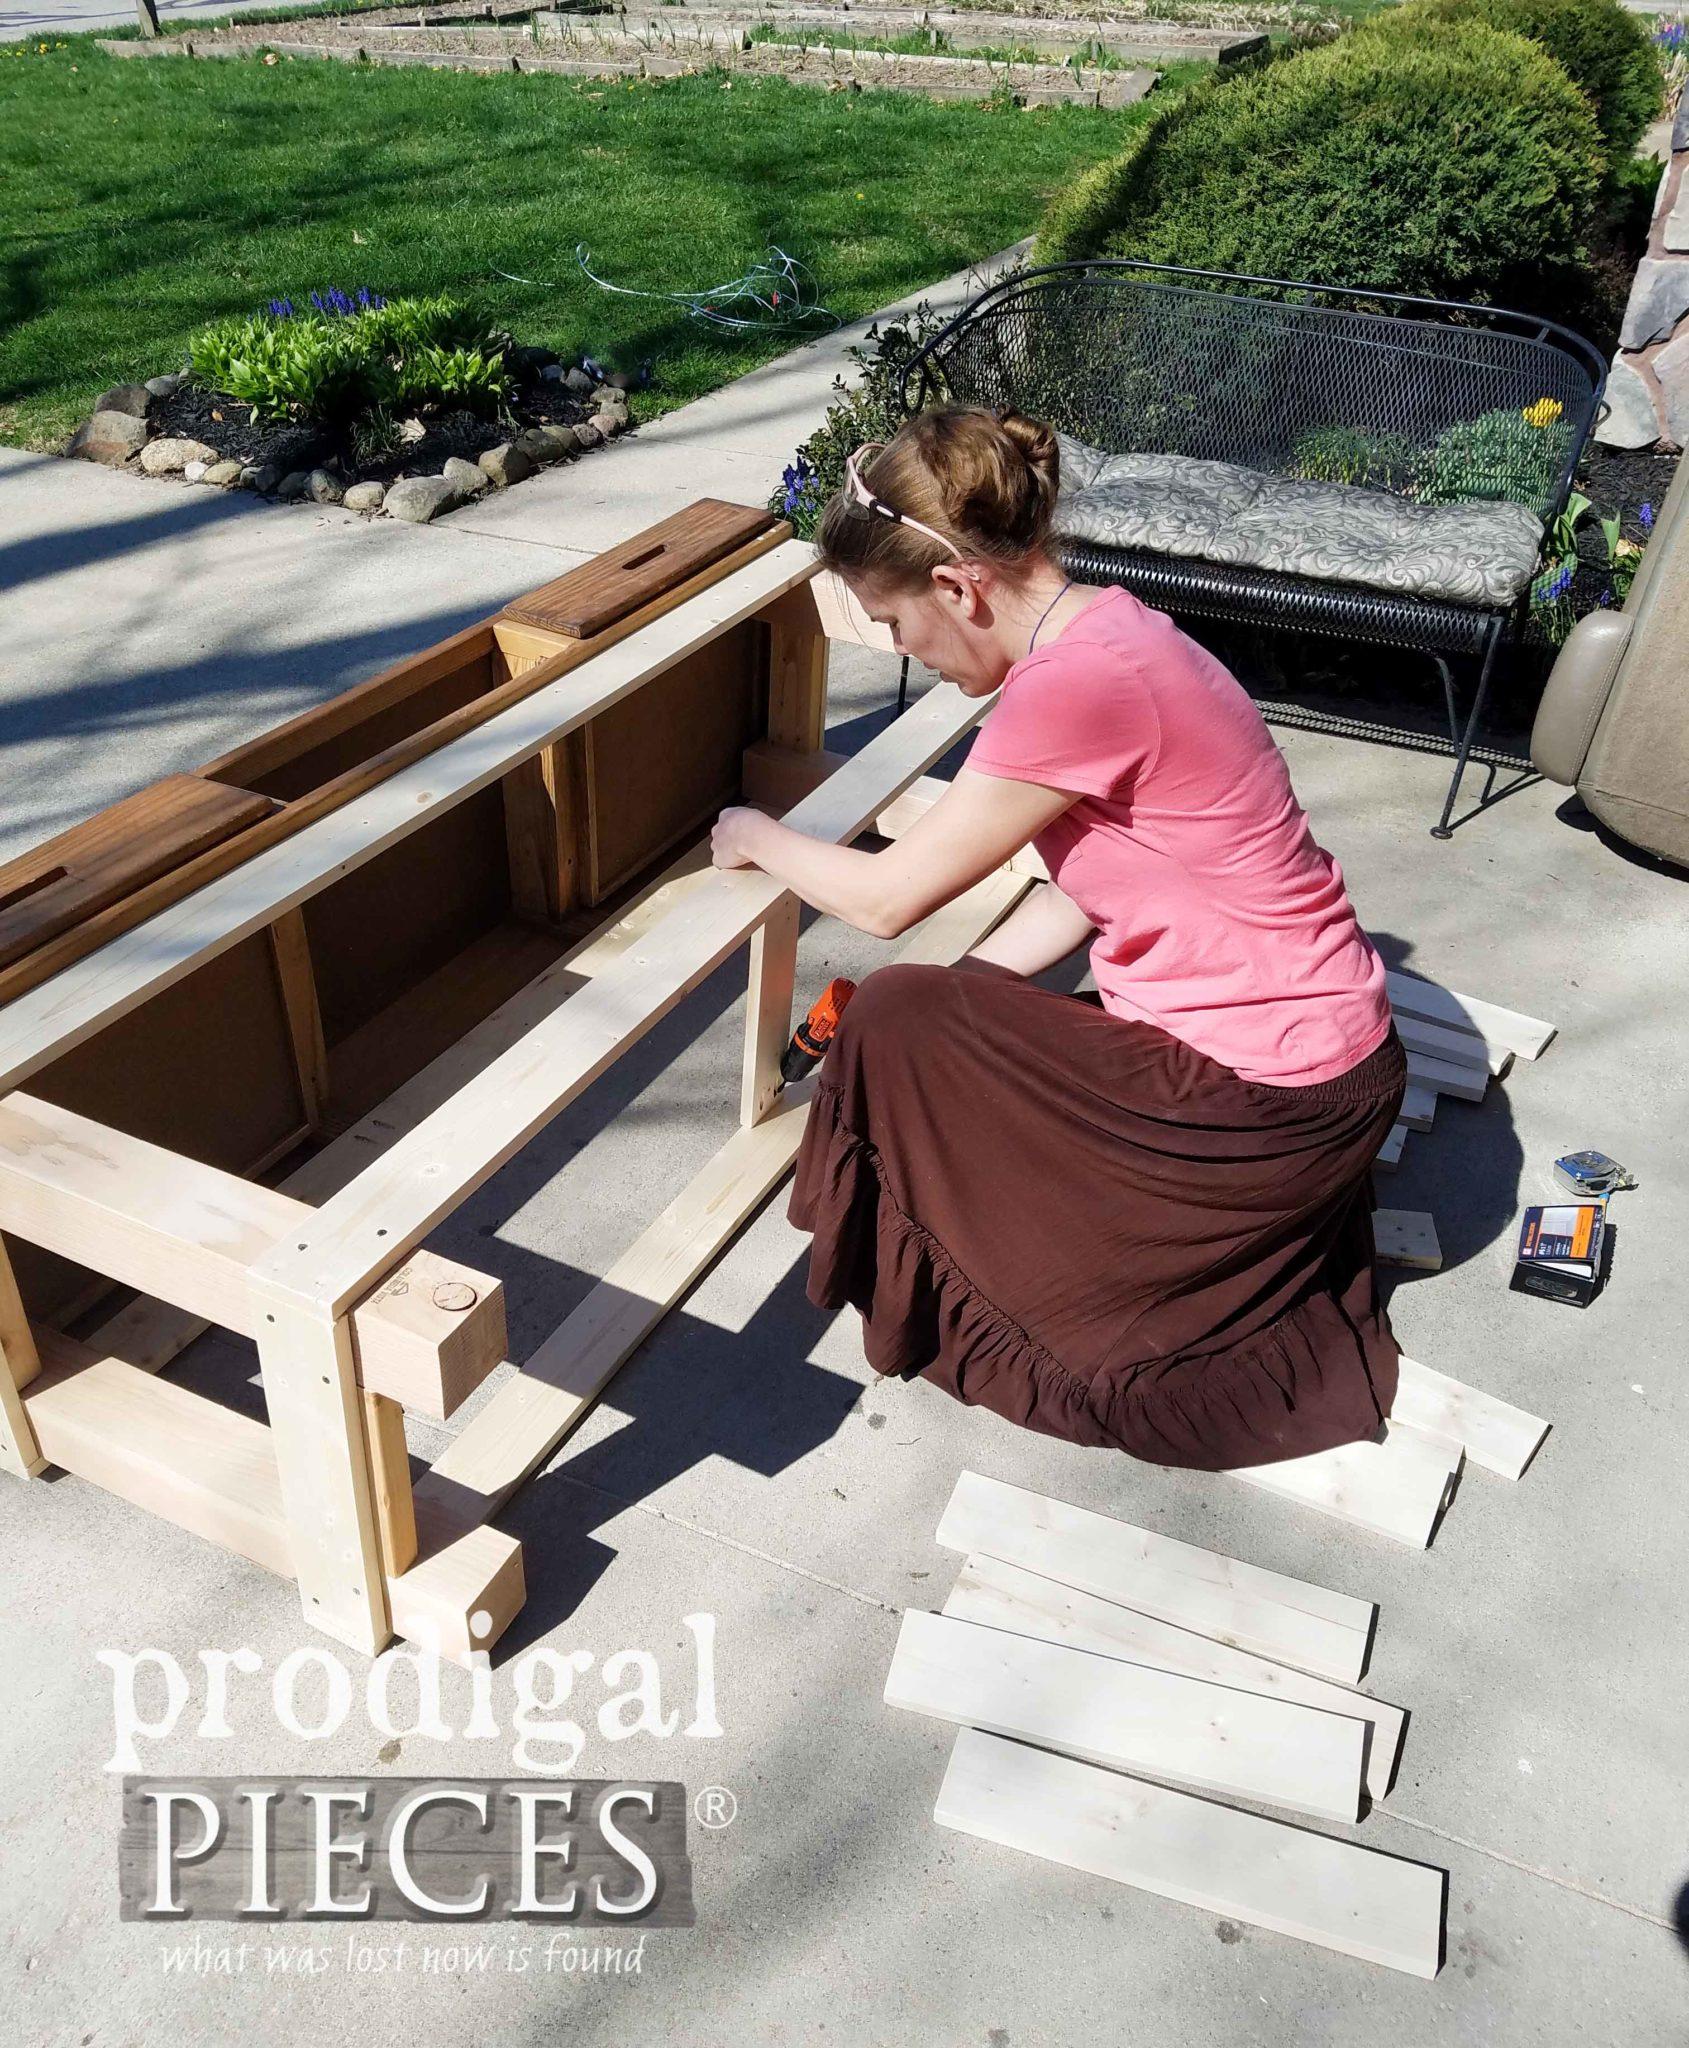 Assembling DIY Farmhouse Workbench built by Larissa of Prodigal Pieces | prodigalpieces.com